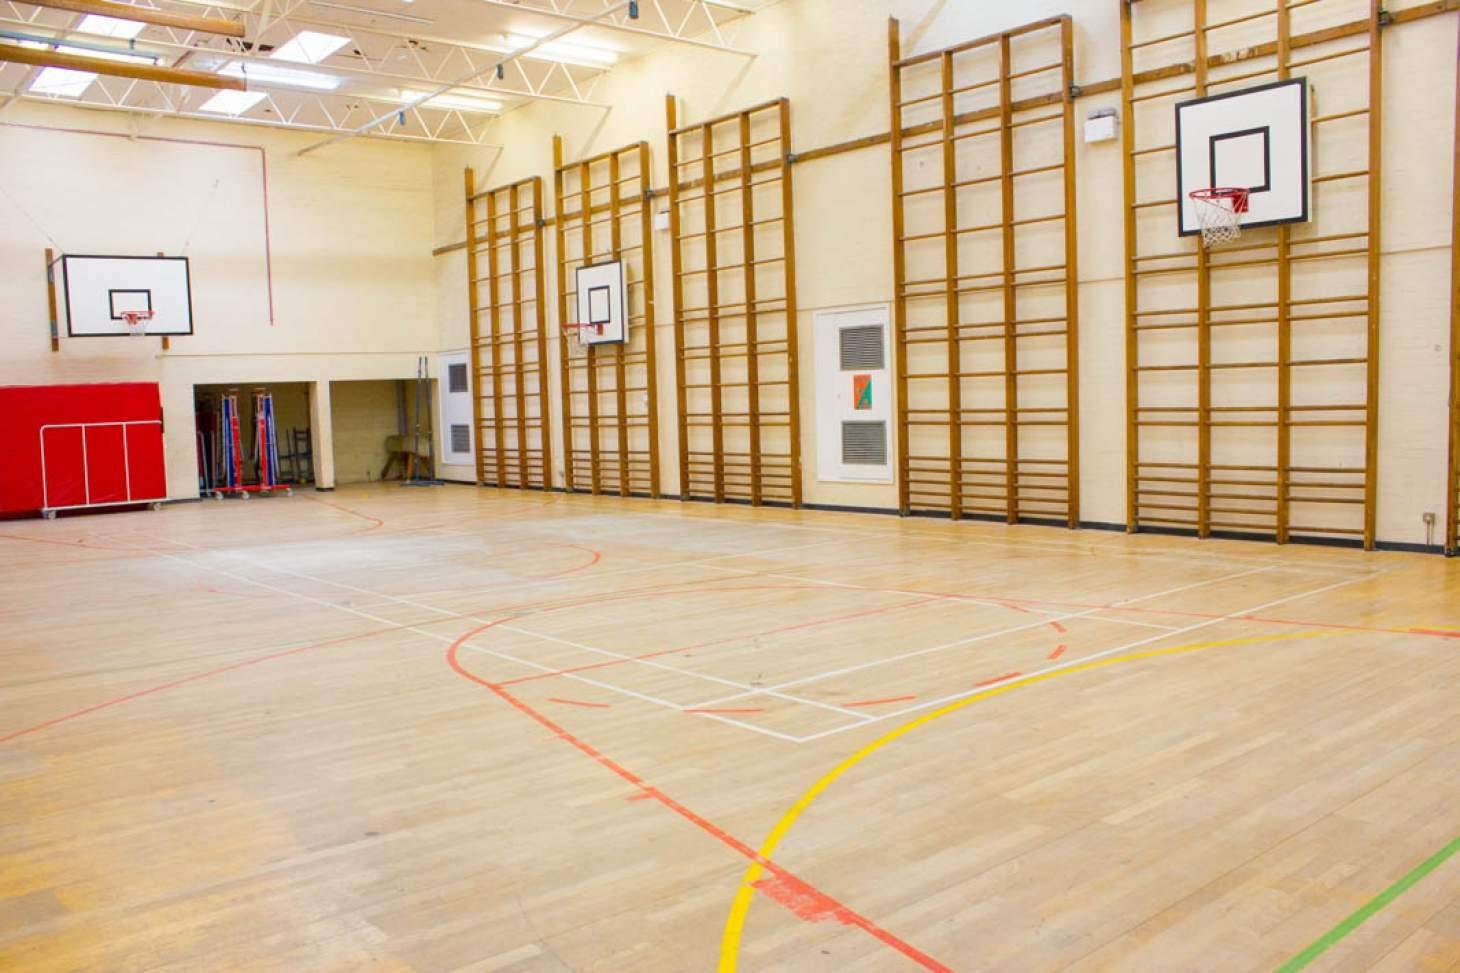 Haileybury Turnford School Indoor basketball court